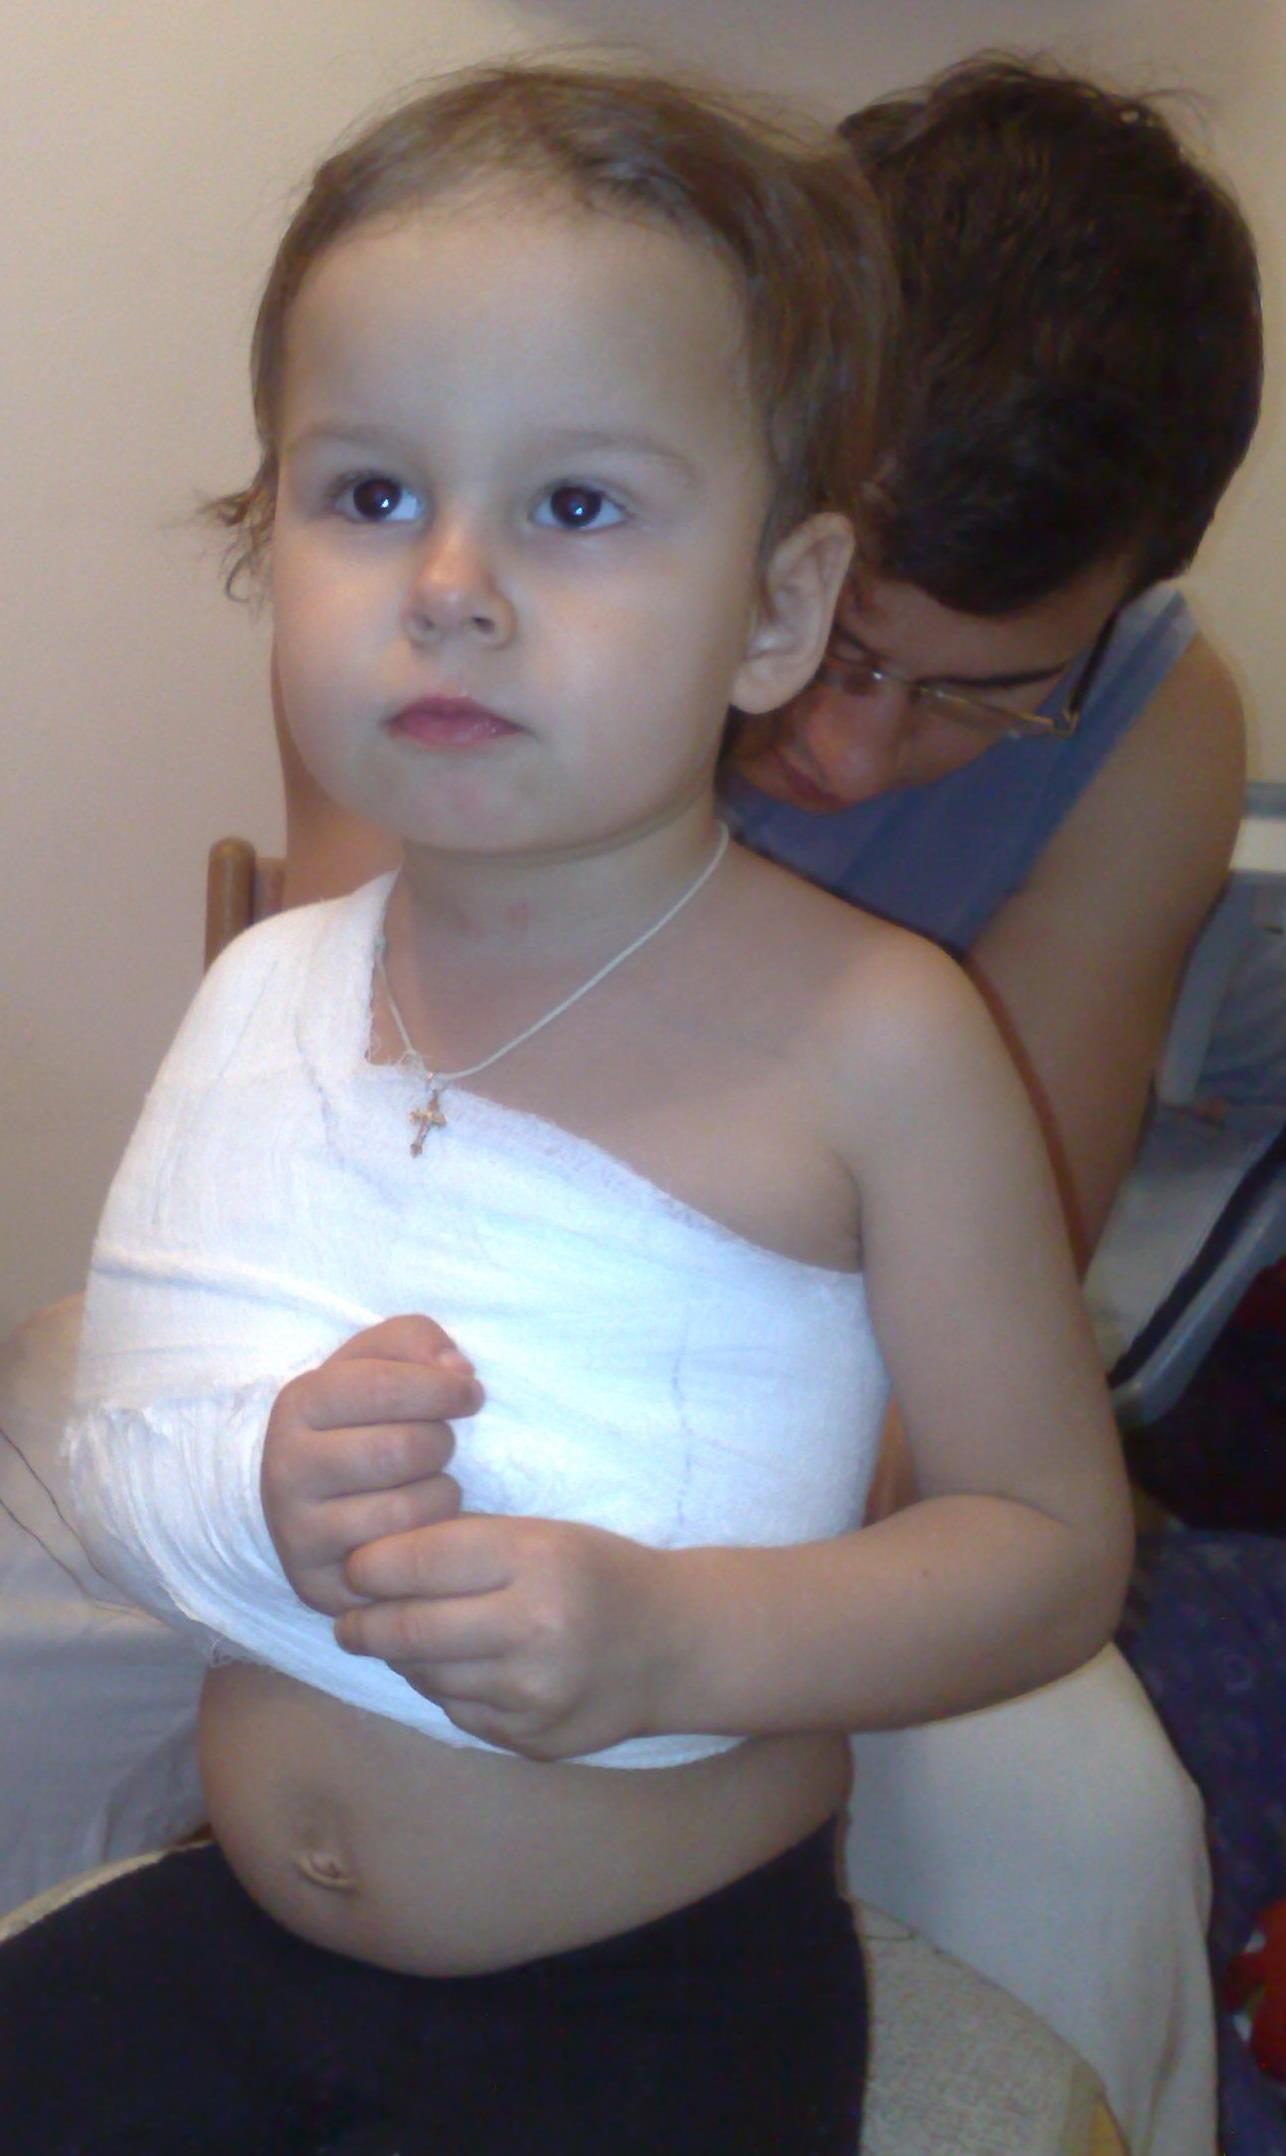 Повязка при переломе ключицы у ребенка фото